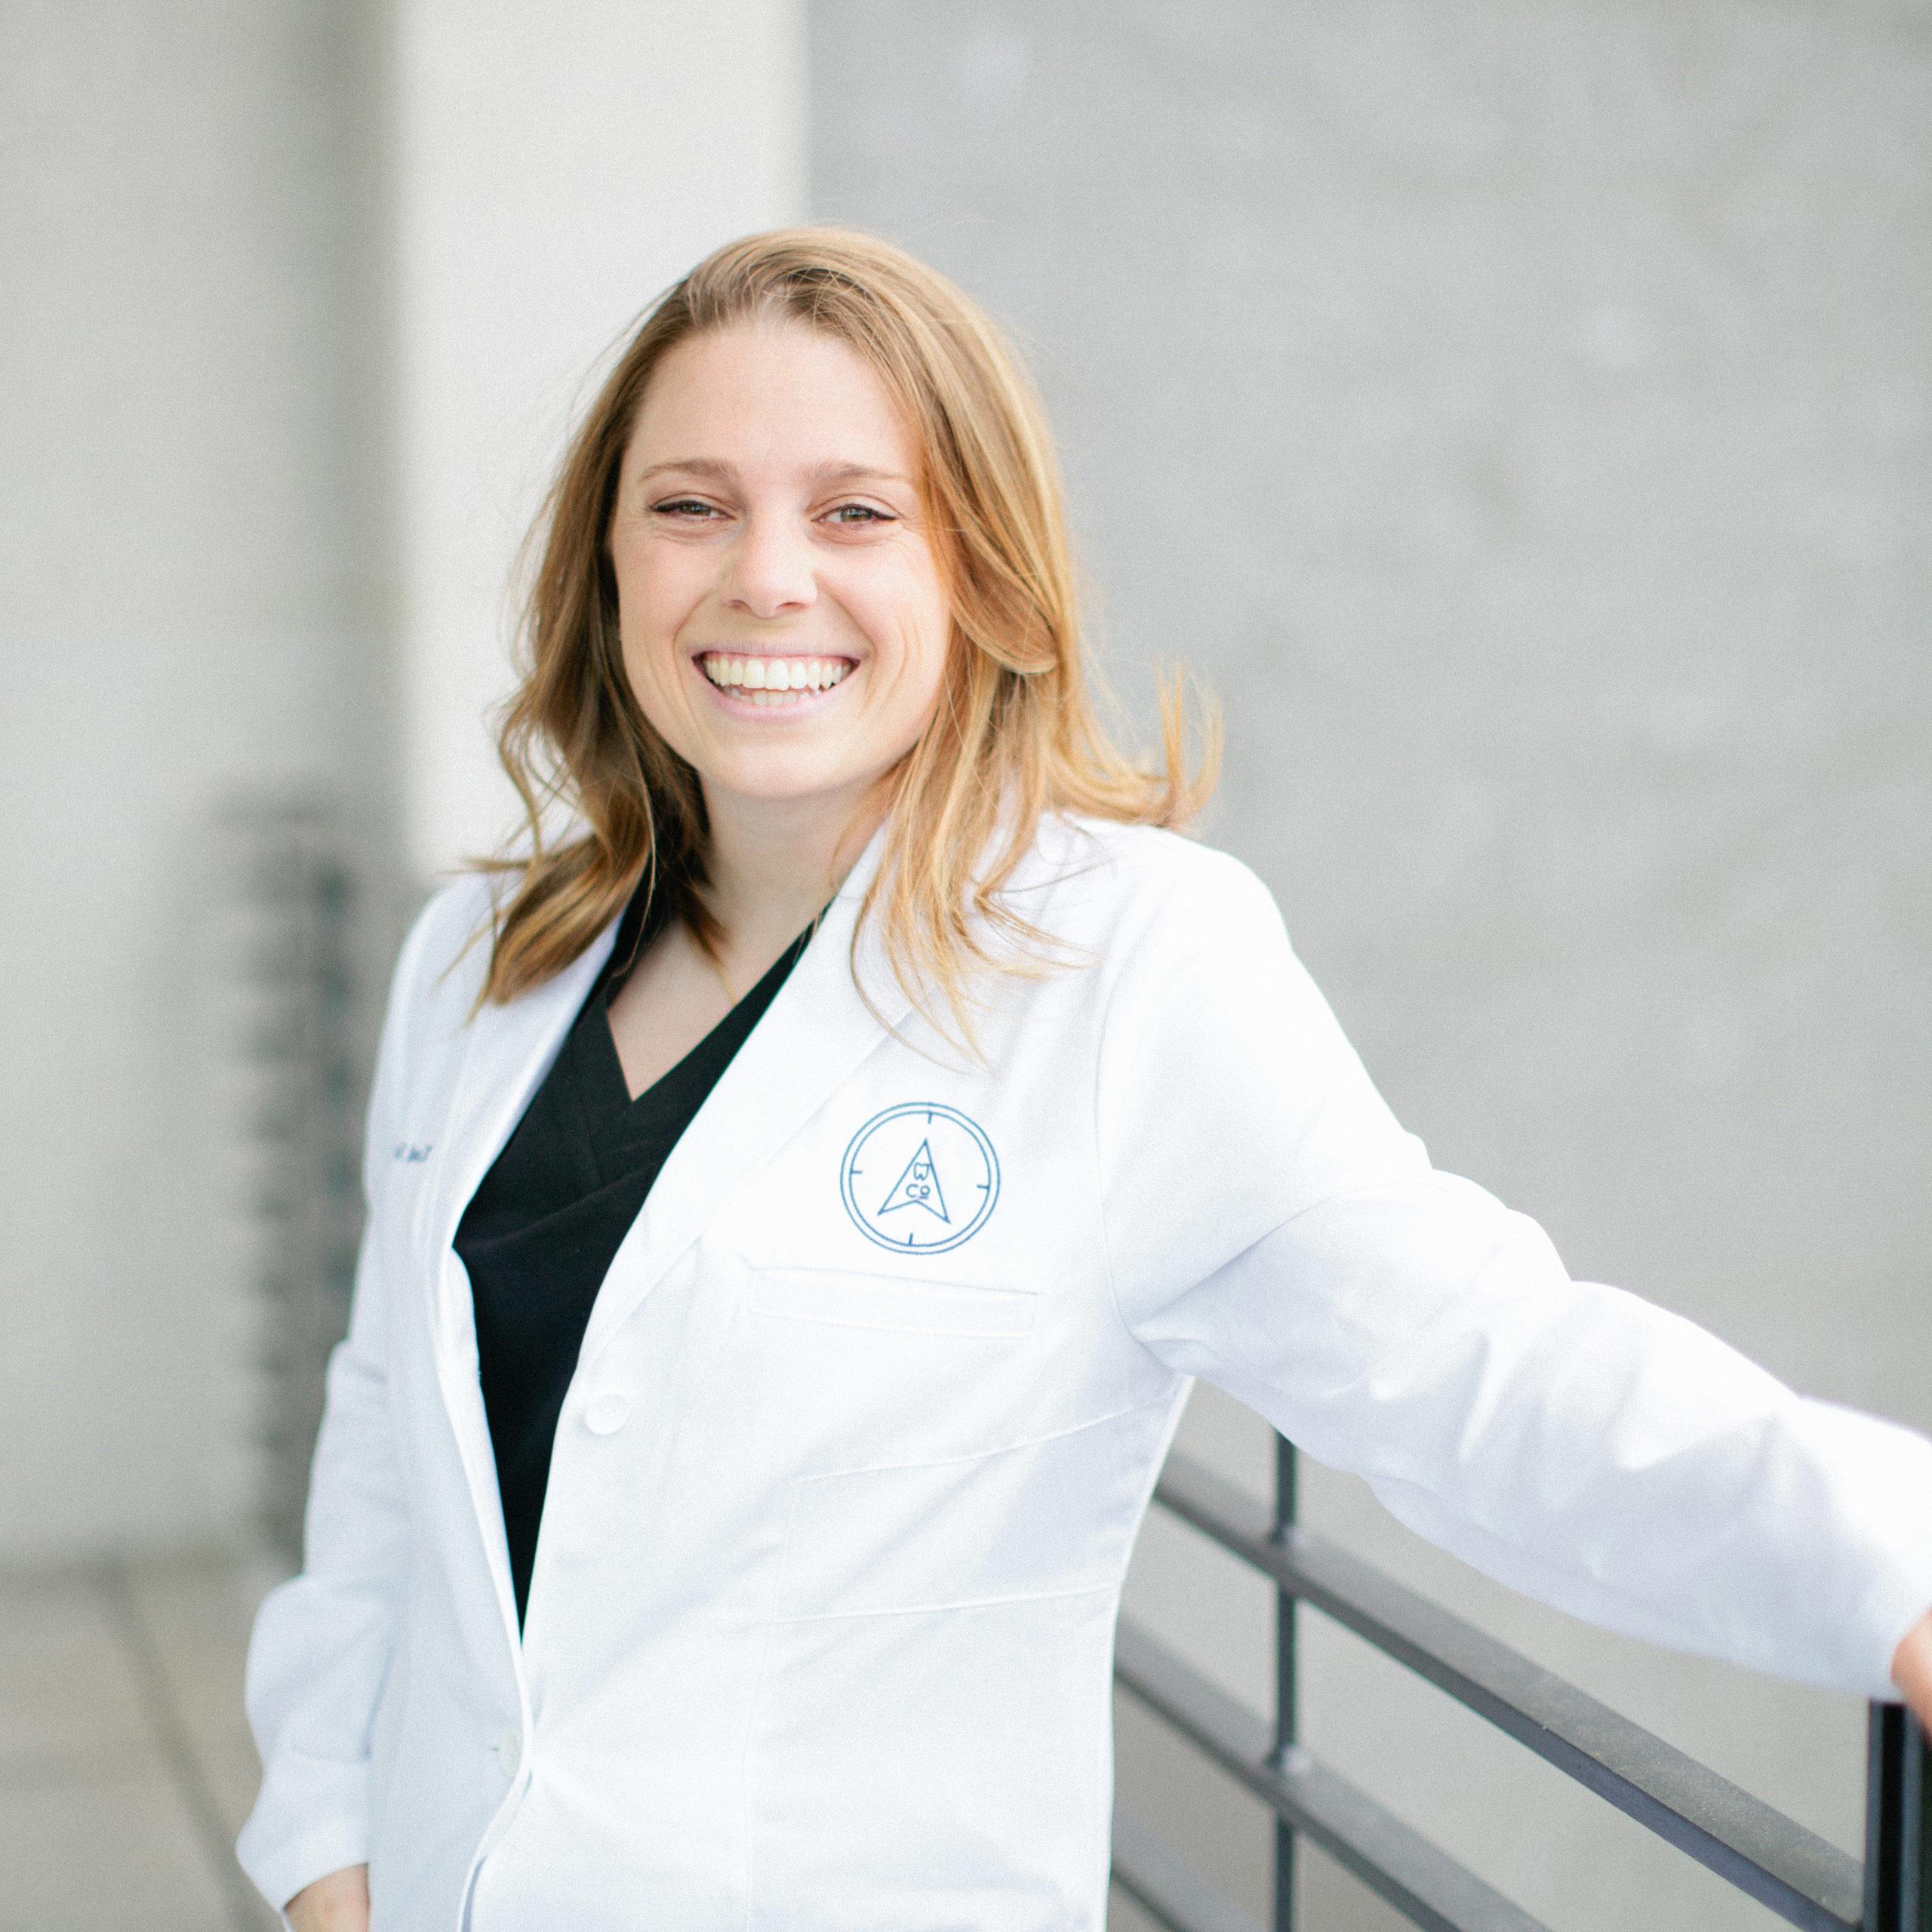 Dr. Chelsea Tolbert - Dentist in RIchmond, VA